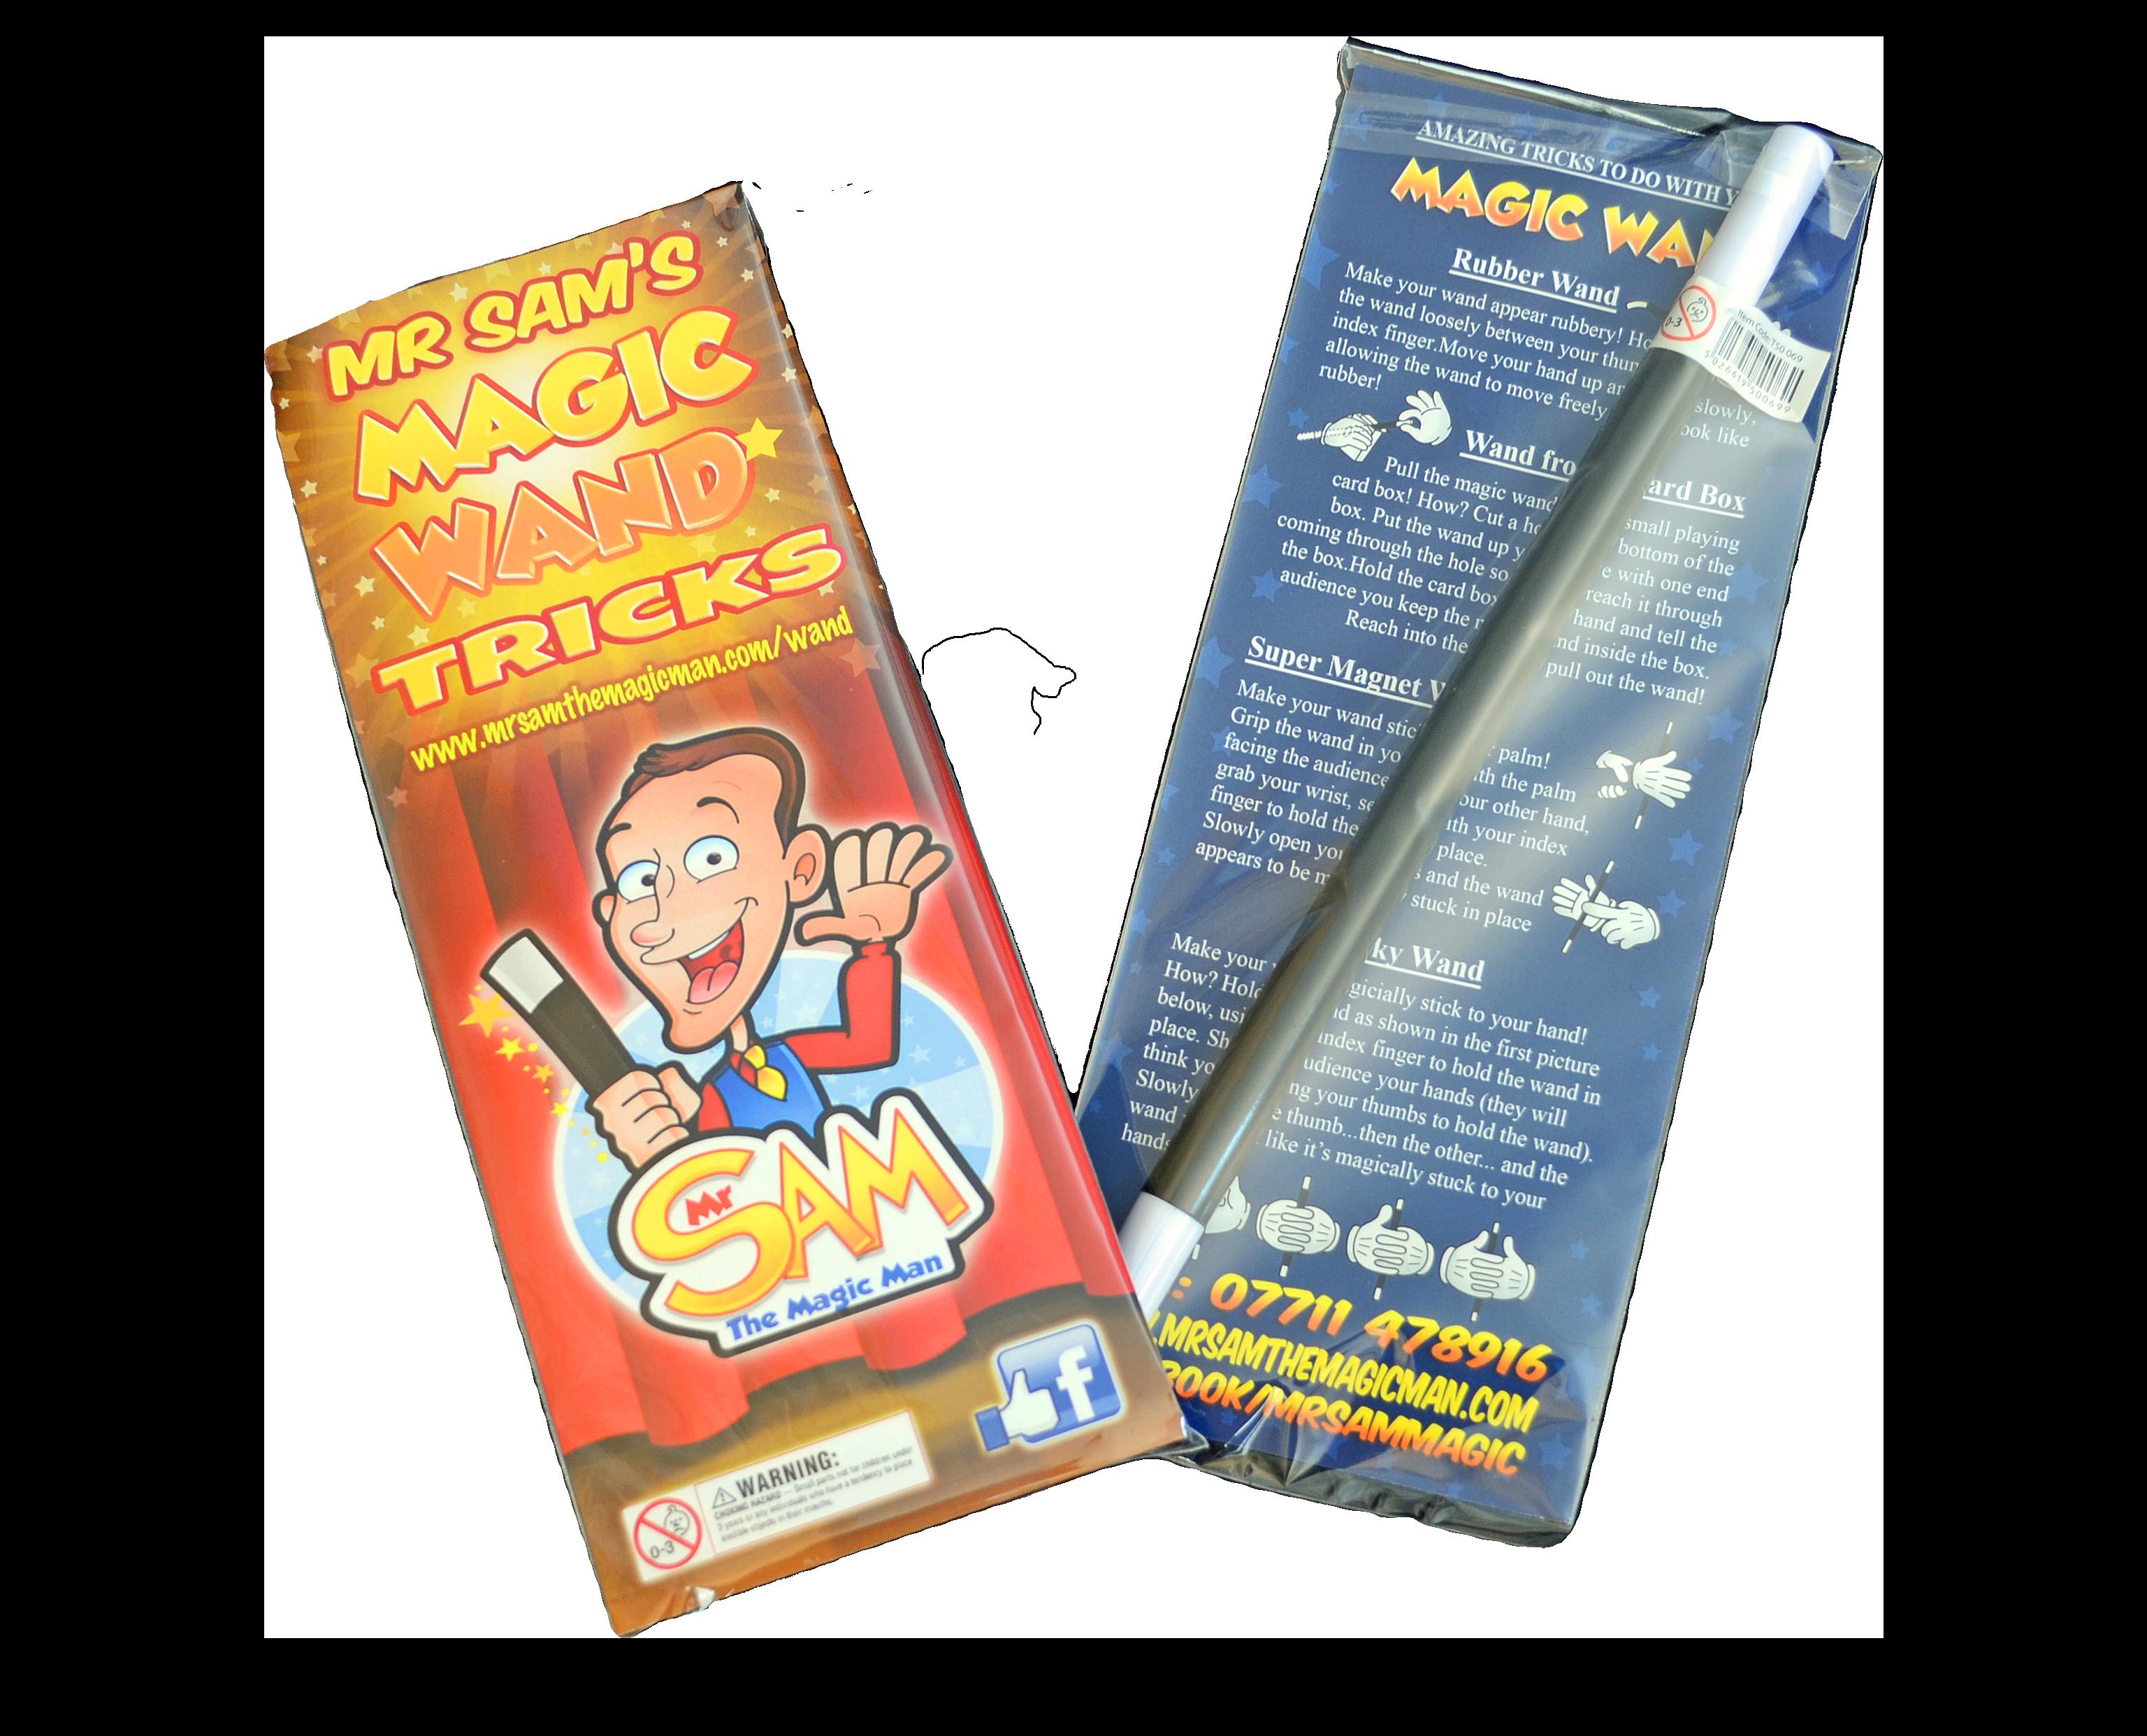 magic wand packs pic